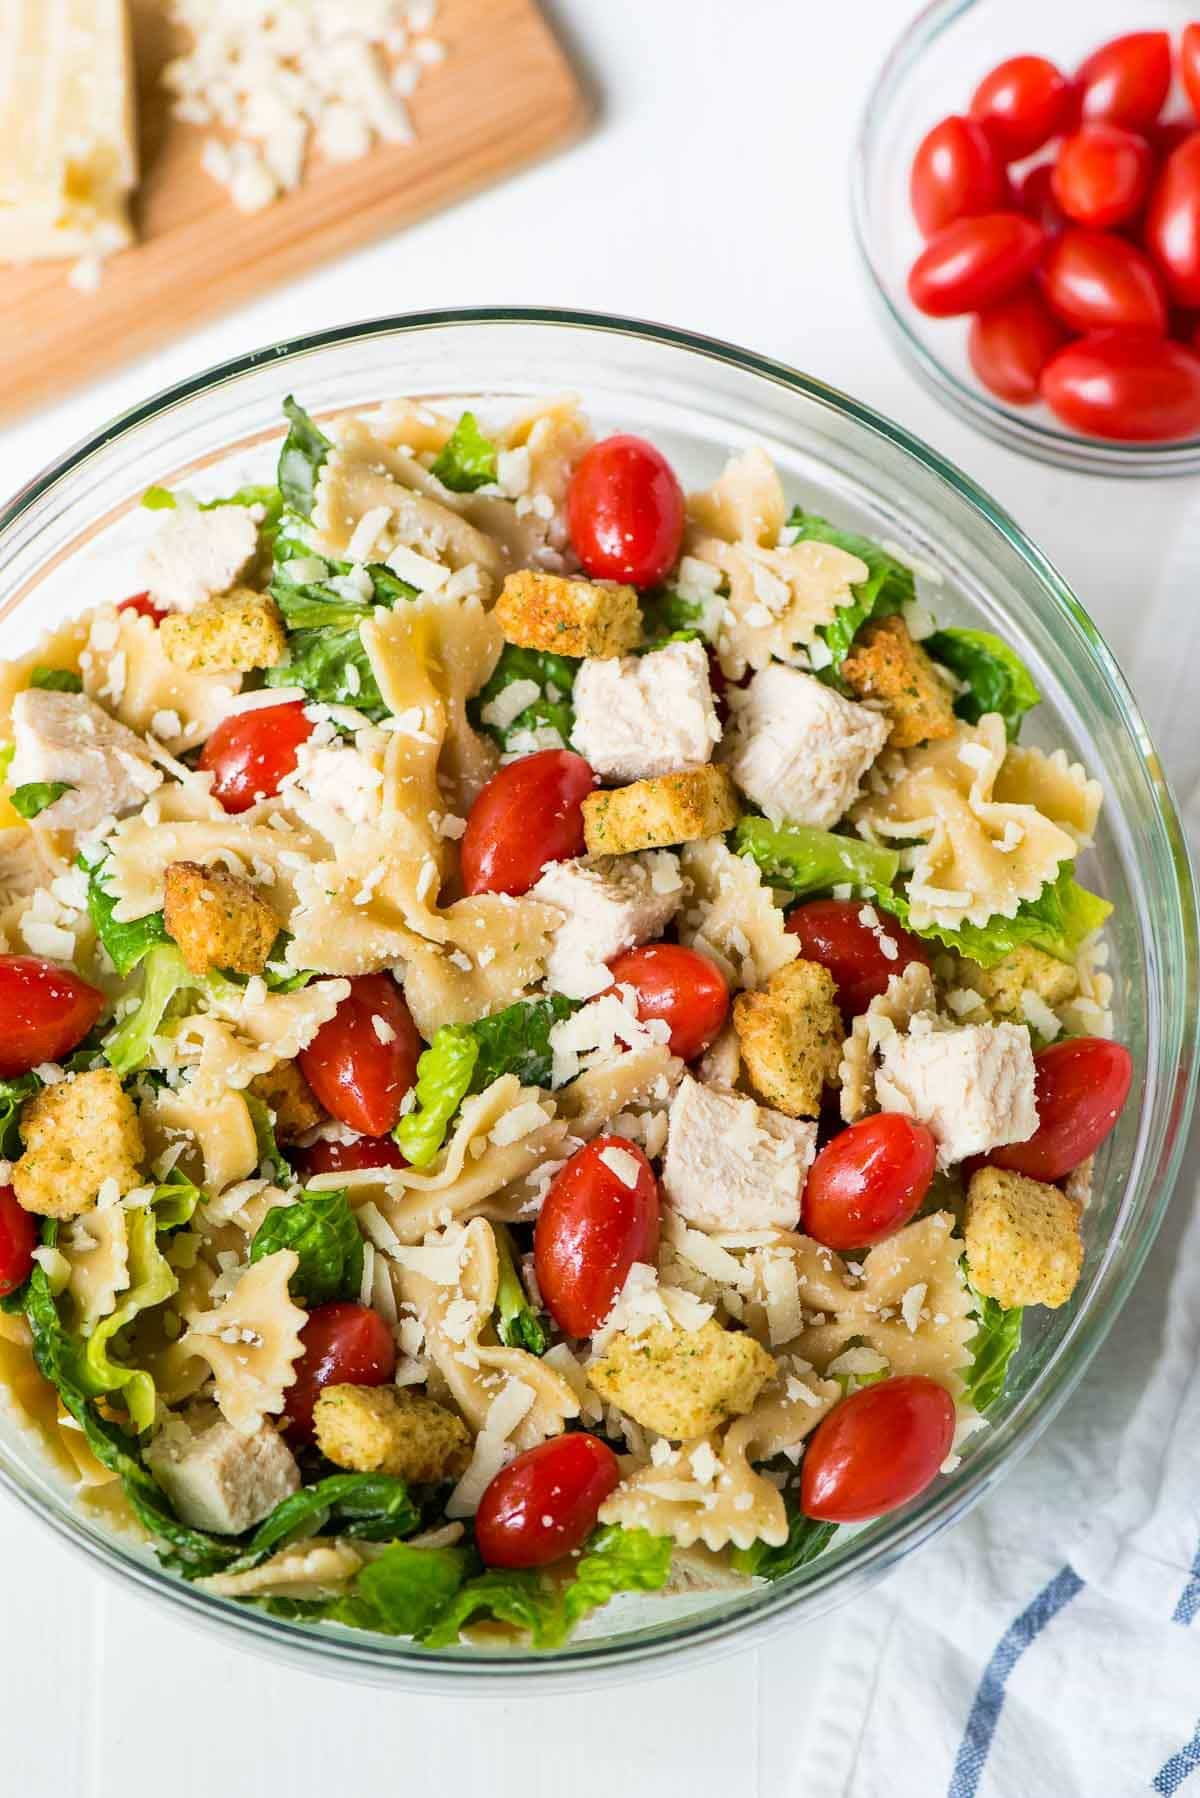 Healthy Pasta Salad  Asian Noodle Salad with Creamy Peanut Dressing